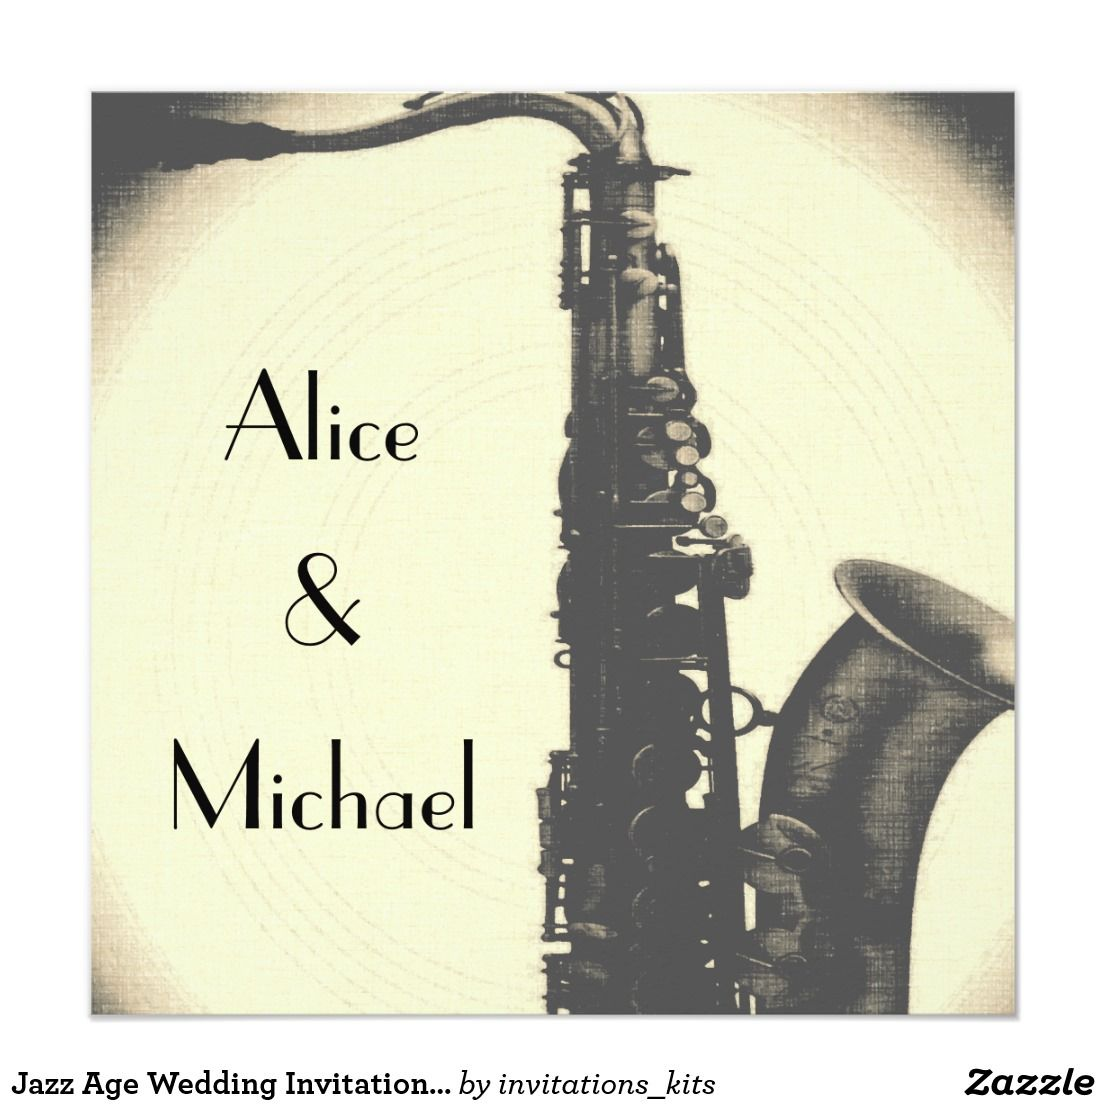 Jazz Age Wedding Invitation Art Deco Style